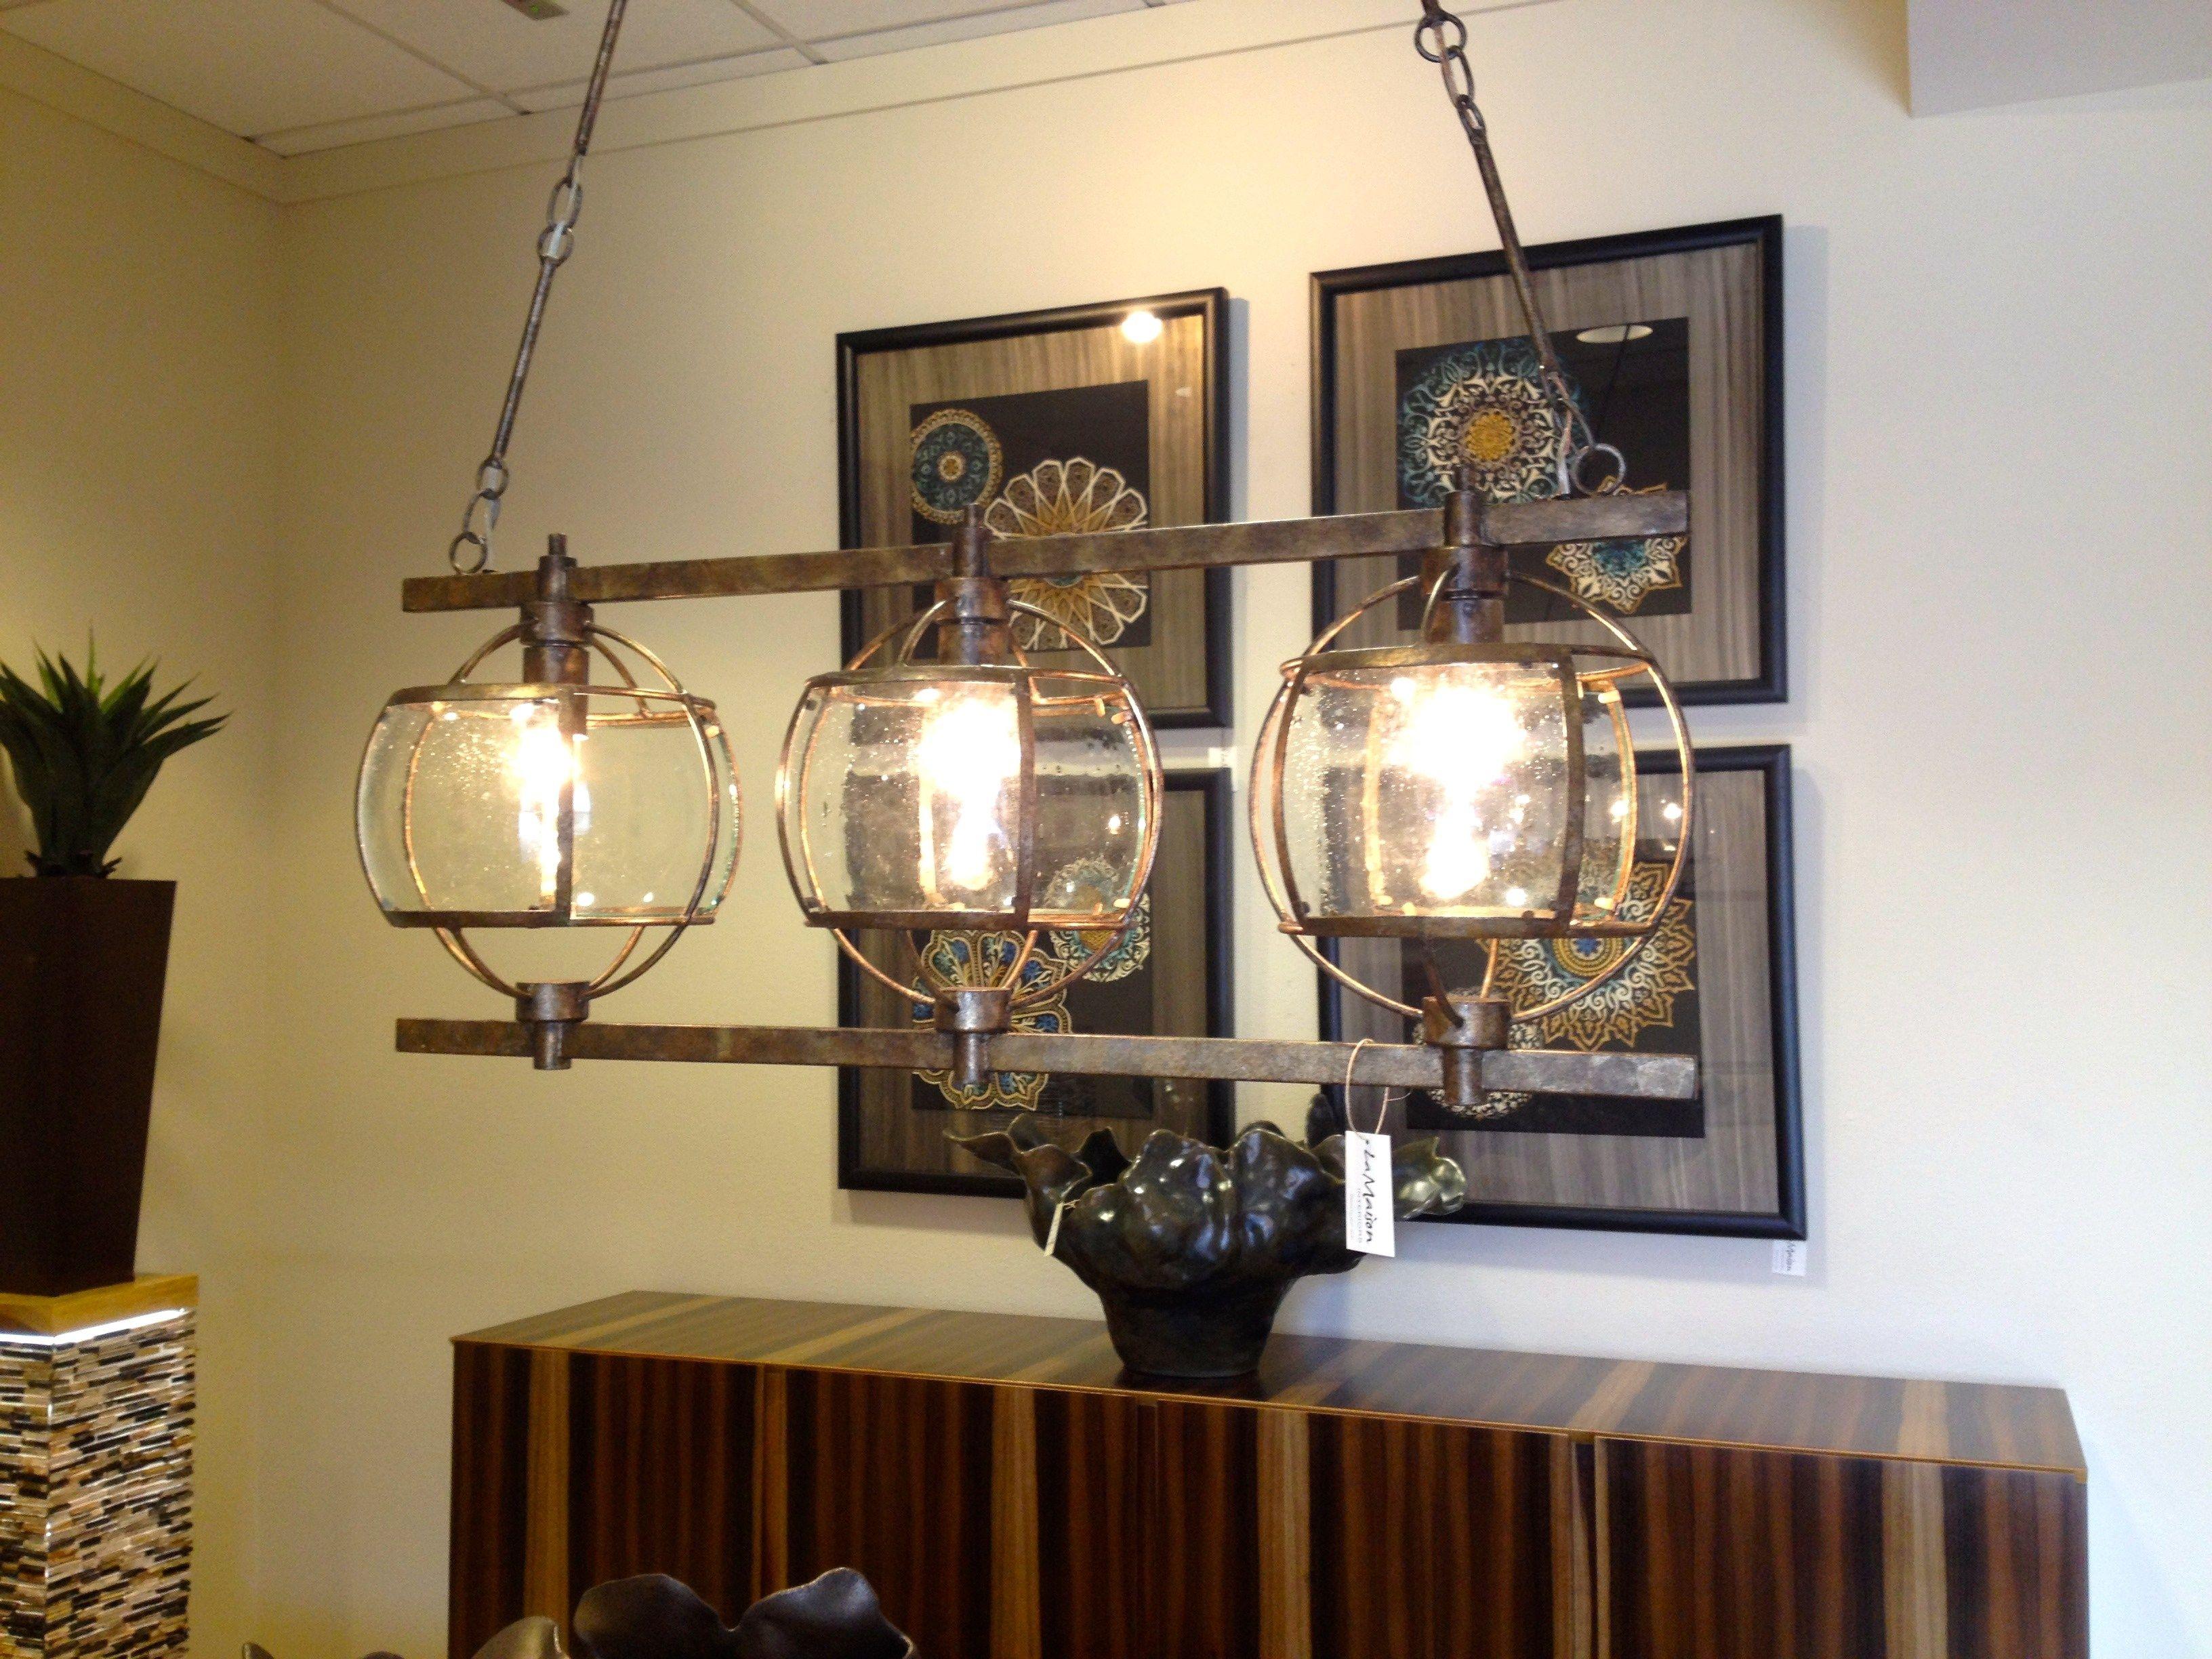 Dining Room Pendant Lighting Fixtures Dining Room Pendant Wall